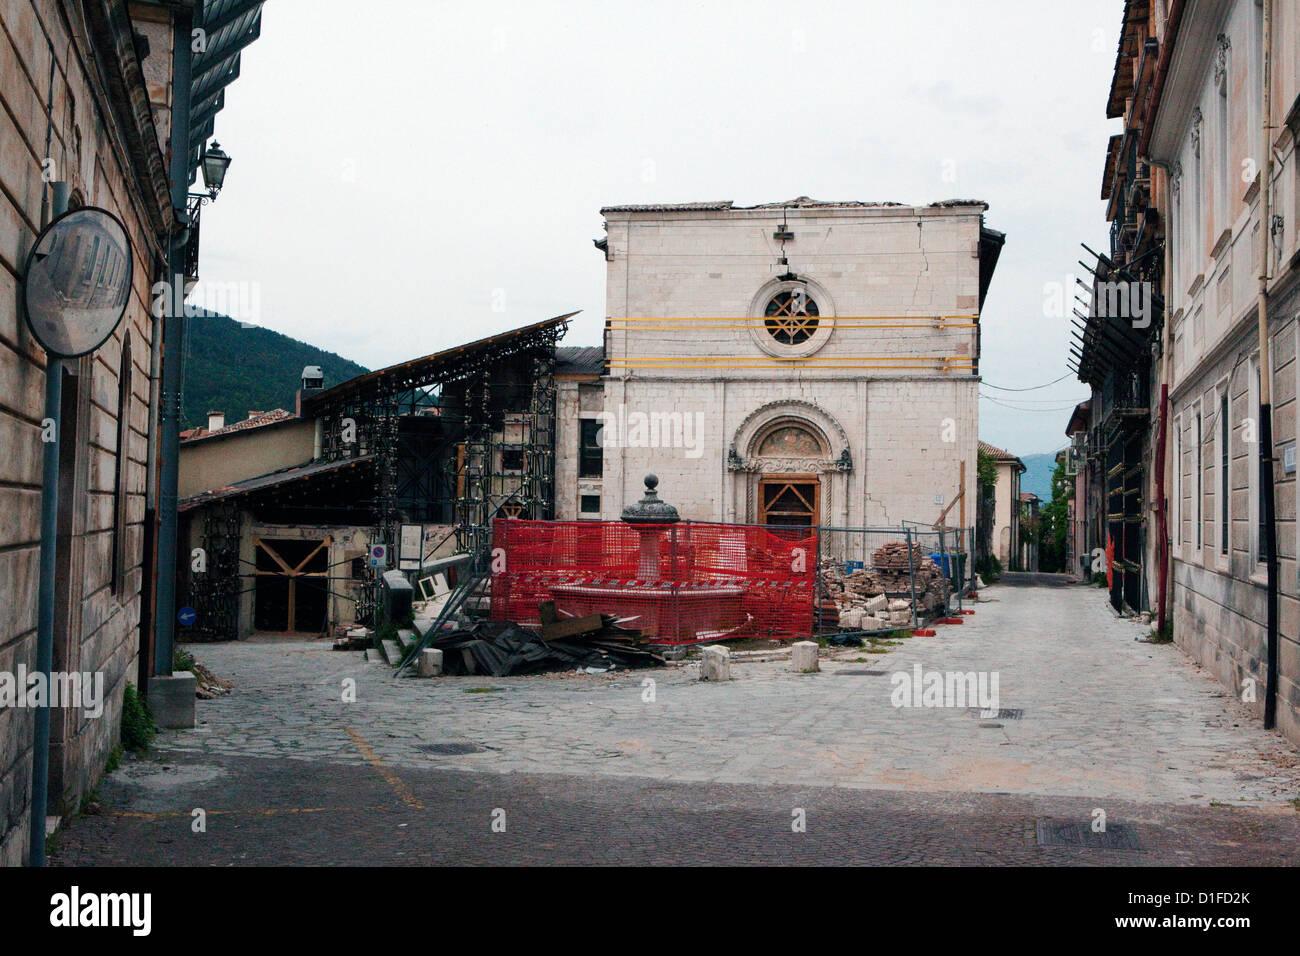 La Misericordia showing the destruction of the 2009 eathquake, Aquila, Abruzzi, Italy, Europe - Stock Image